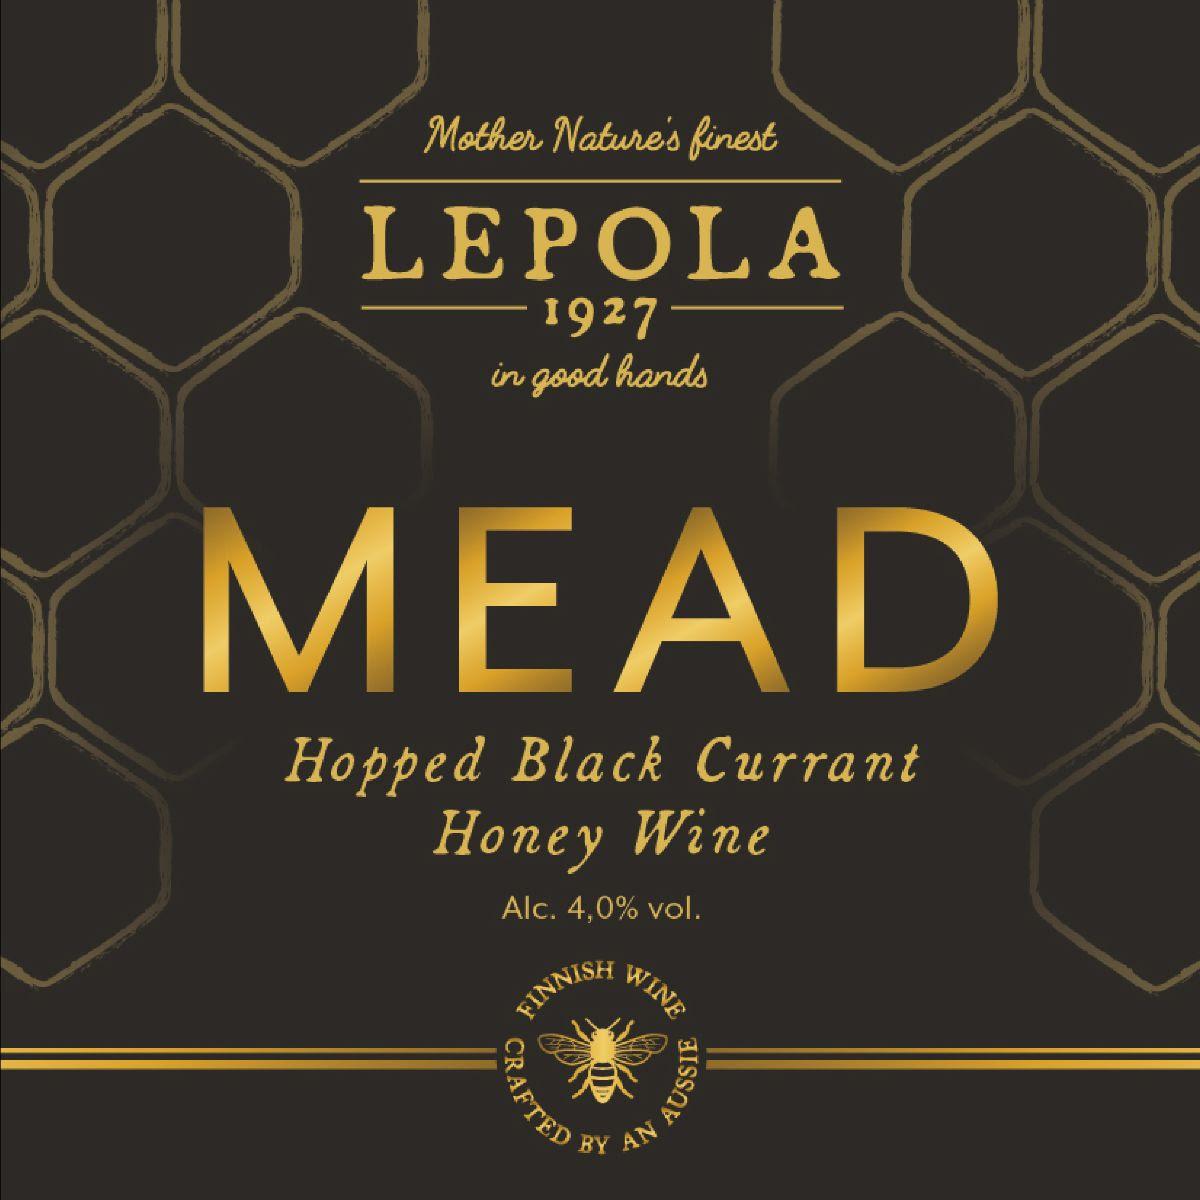 Lepola Hopped Black Currant Mead 4,0% - 0,33l bottle